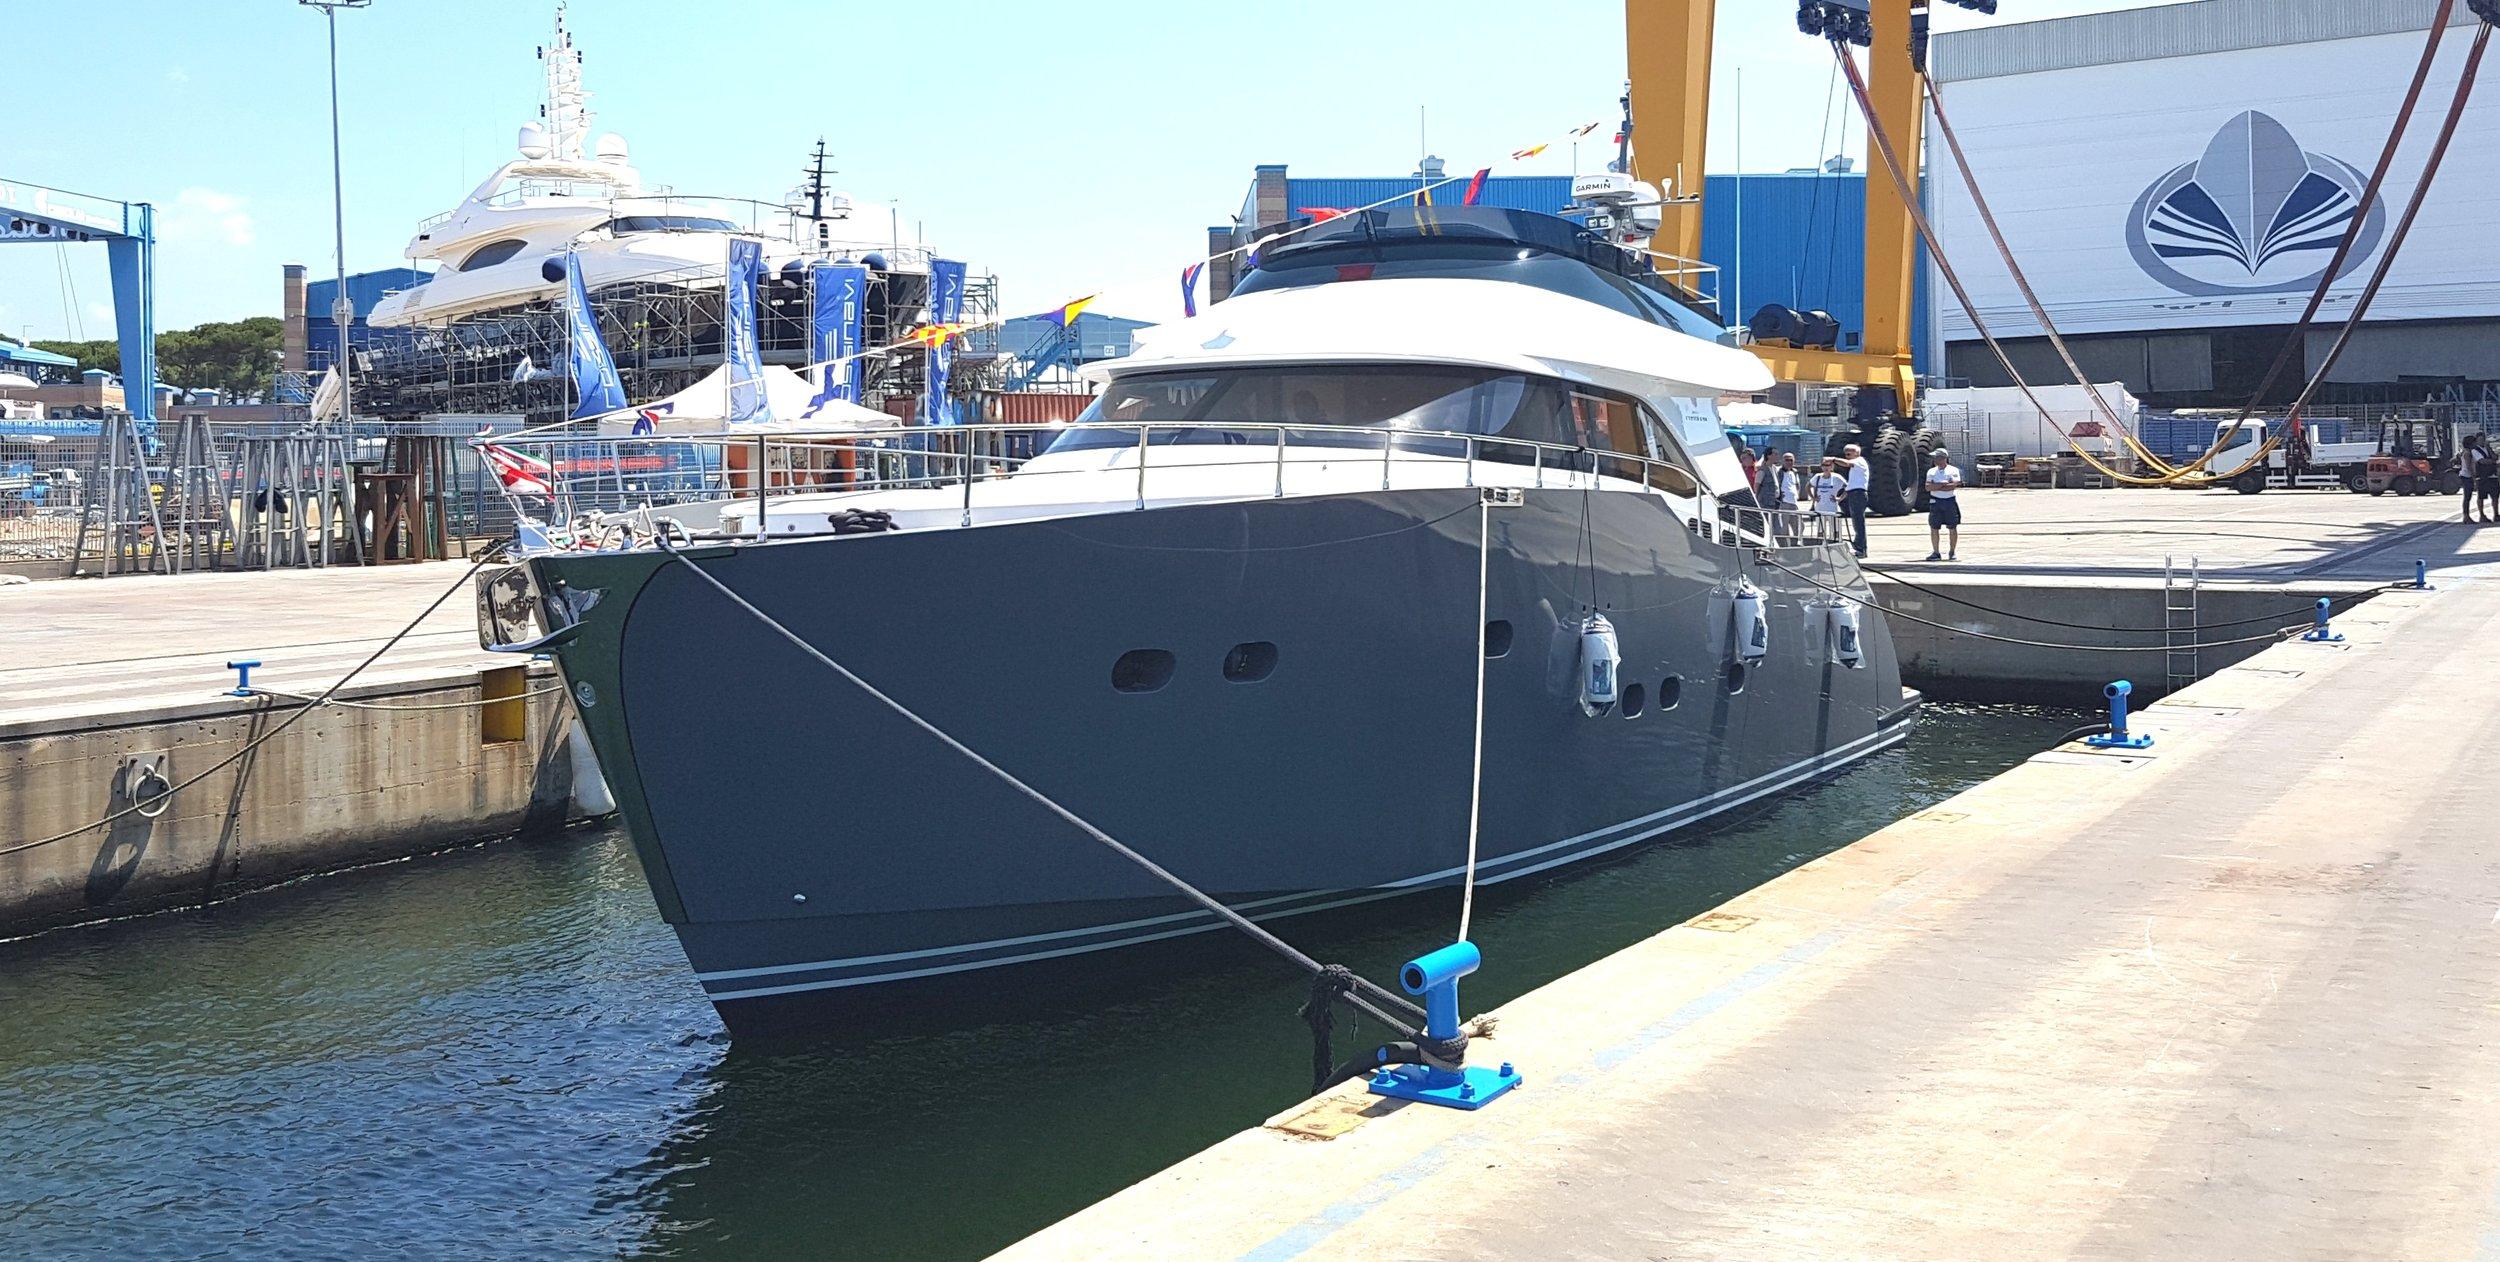 Foto prua-Istante 1 yacht-general arrangement-profile-sketch architect-carignani-design-concept-luxury-boat-motor.jpg